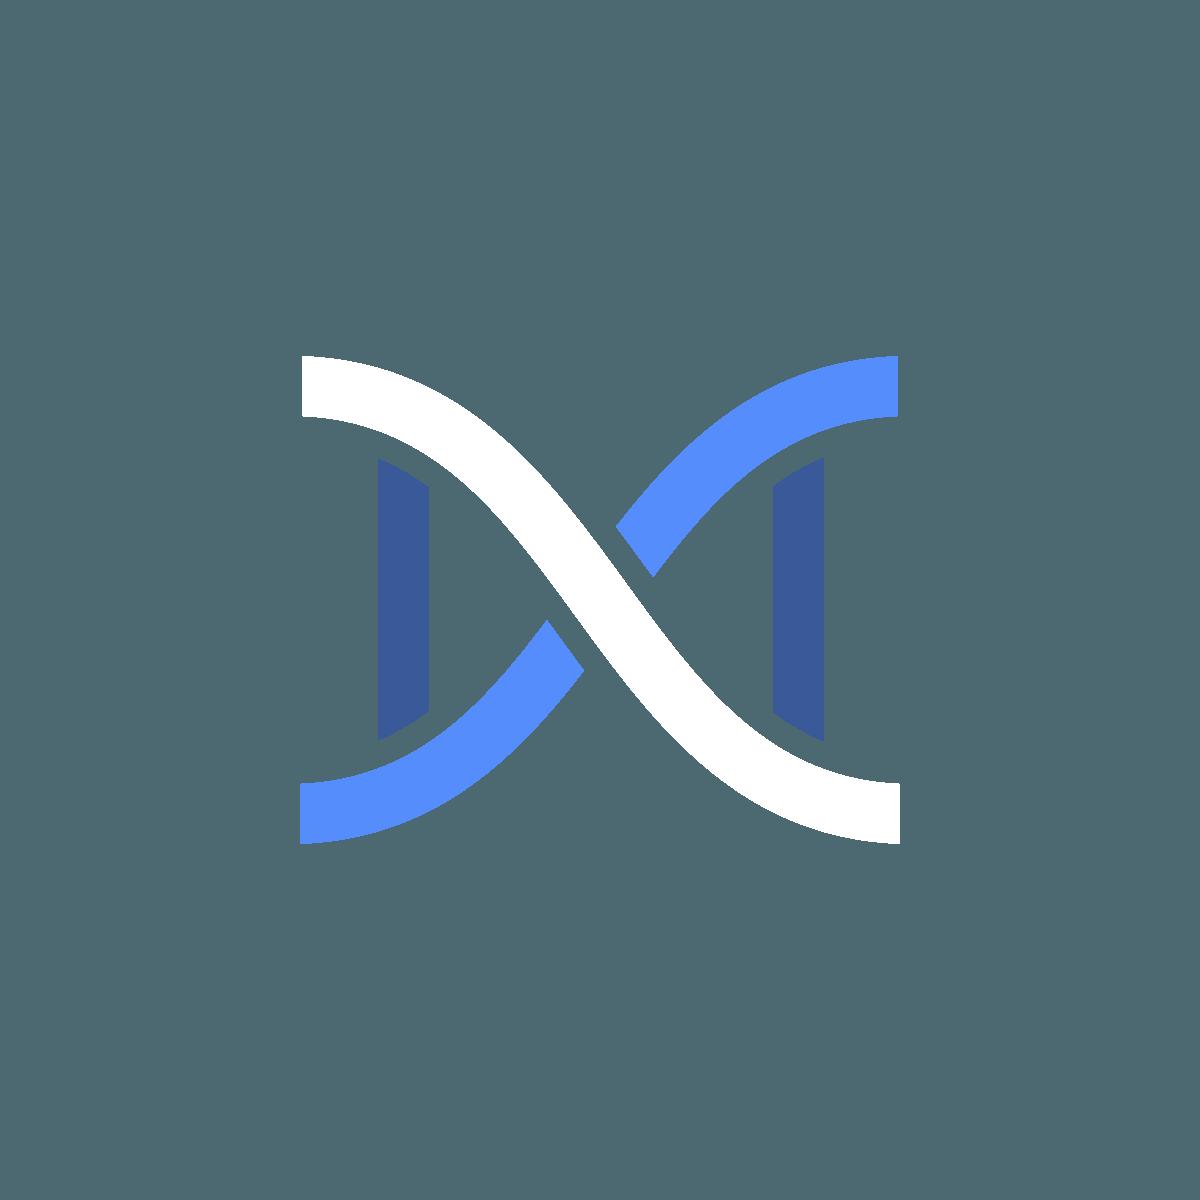 XPLORE_Logo_ICON-4cALT.png